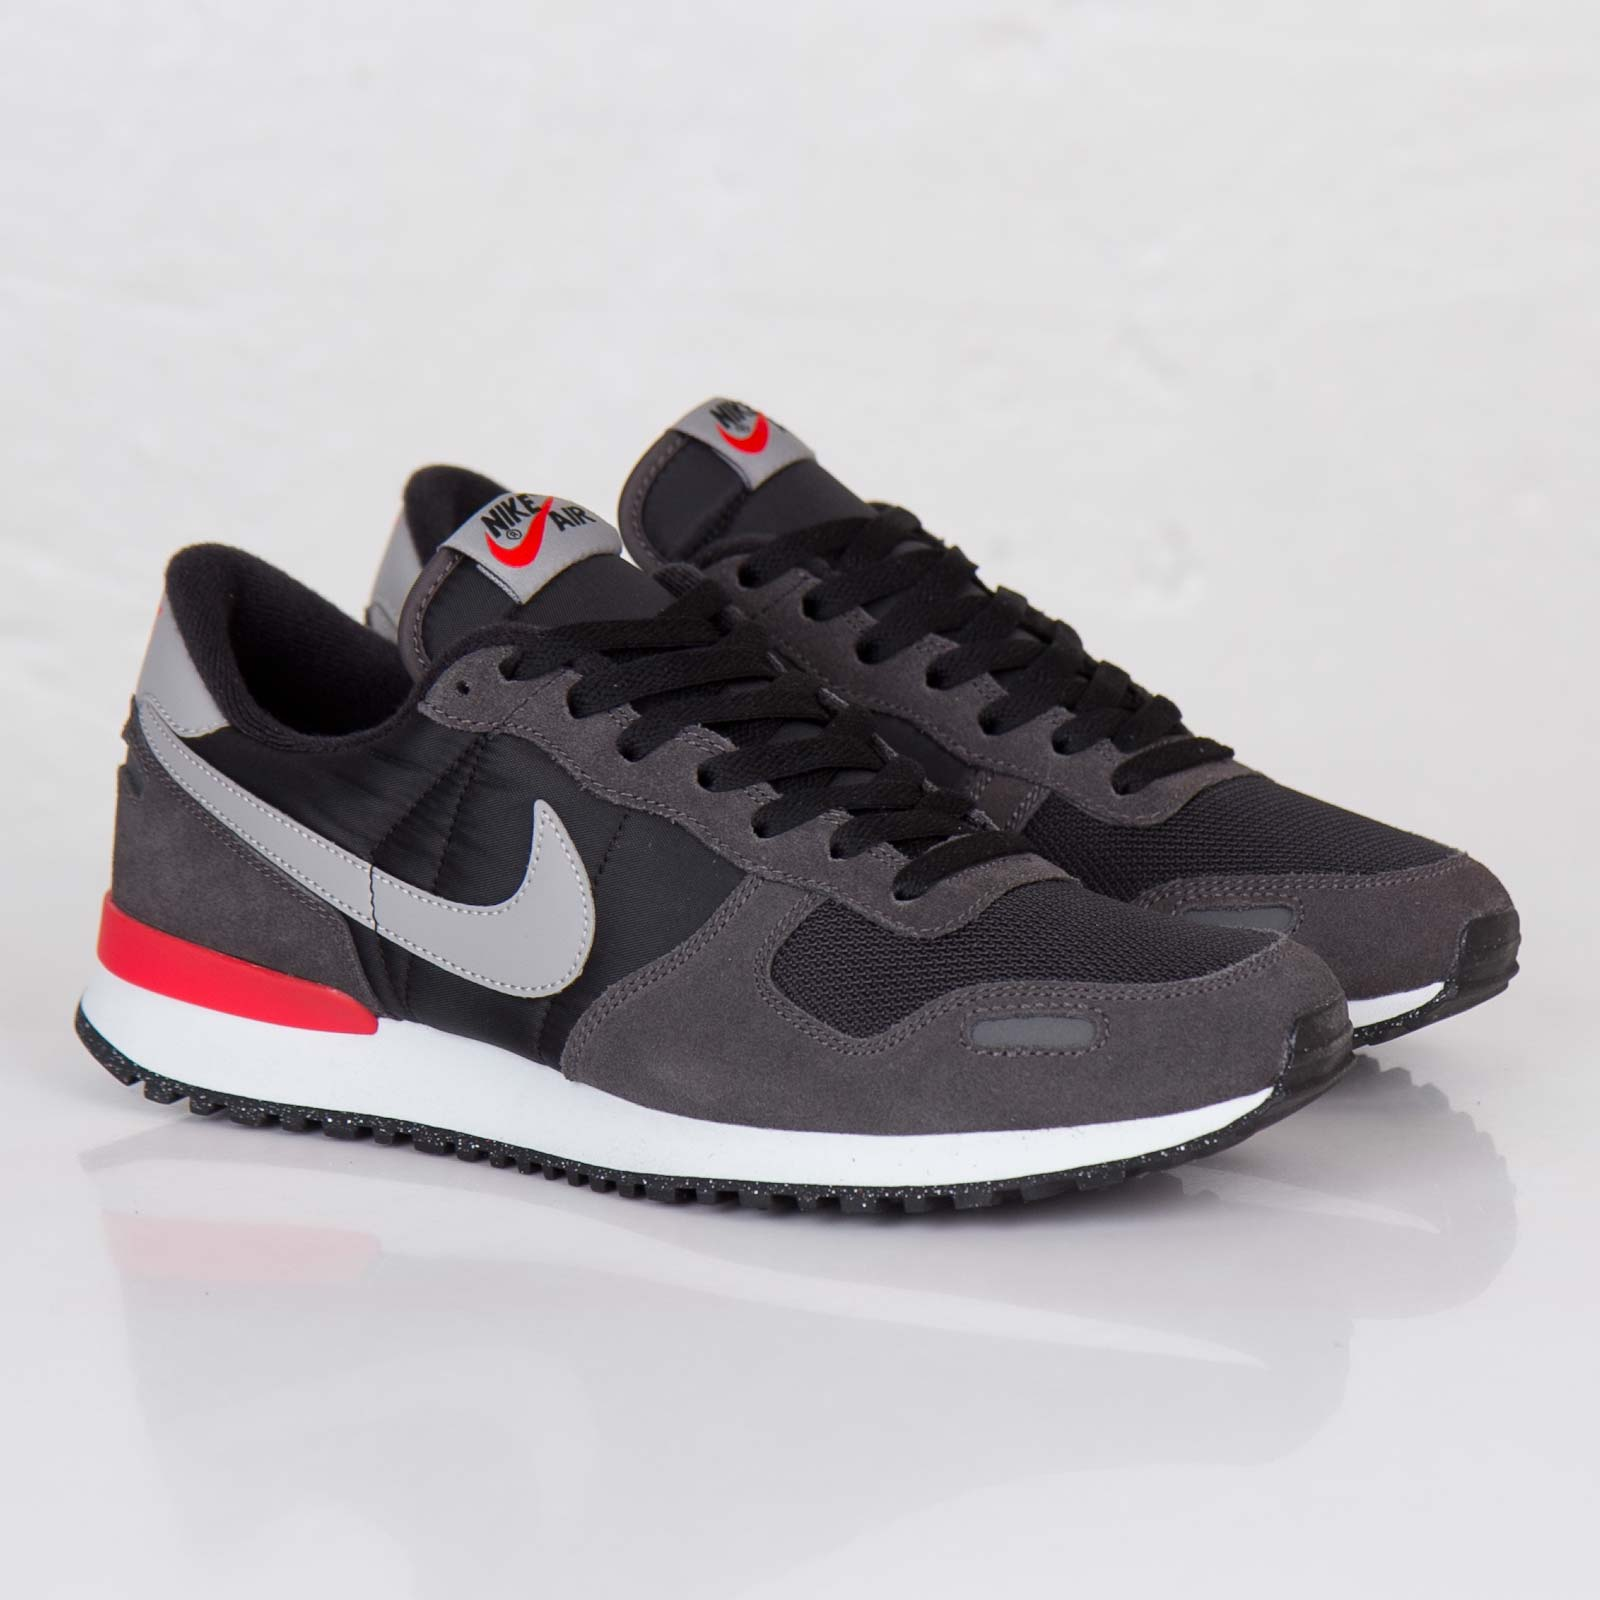 llegada transmitir crecer  Nike Air Vortex Retro - 543216-005 - Sneakersnstuff   sneakers & streetwear  online since 1999